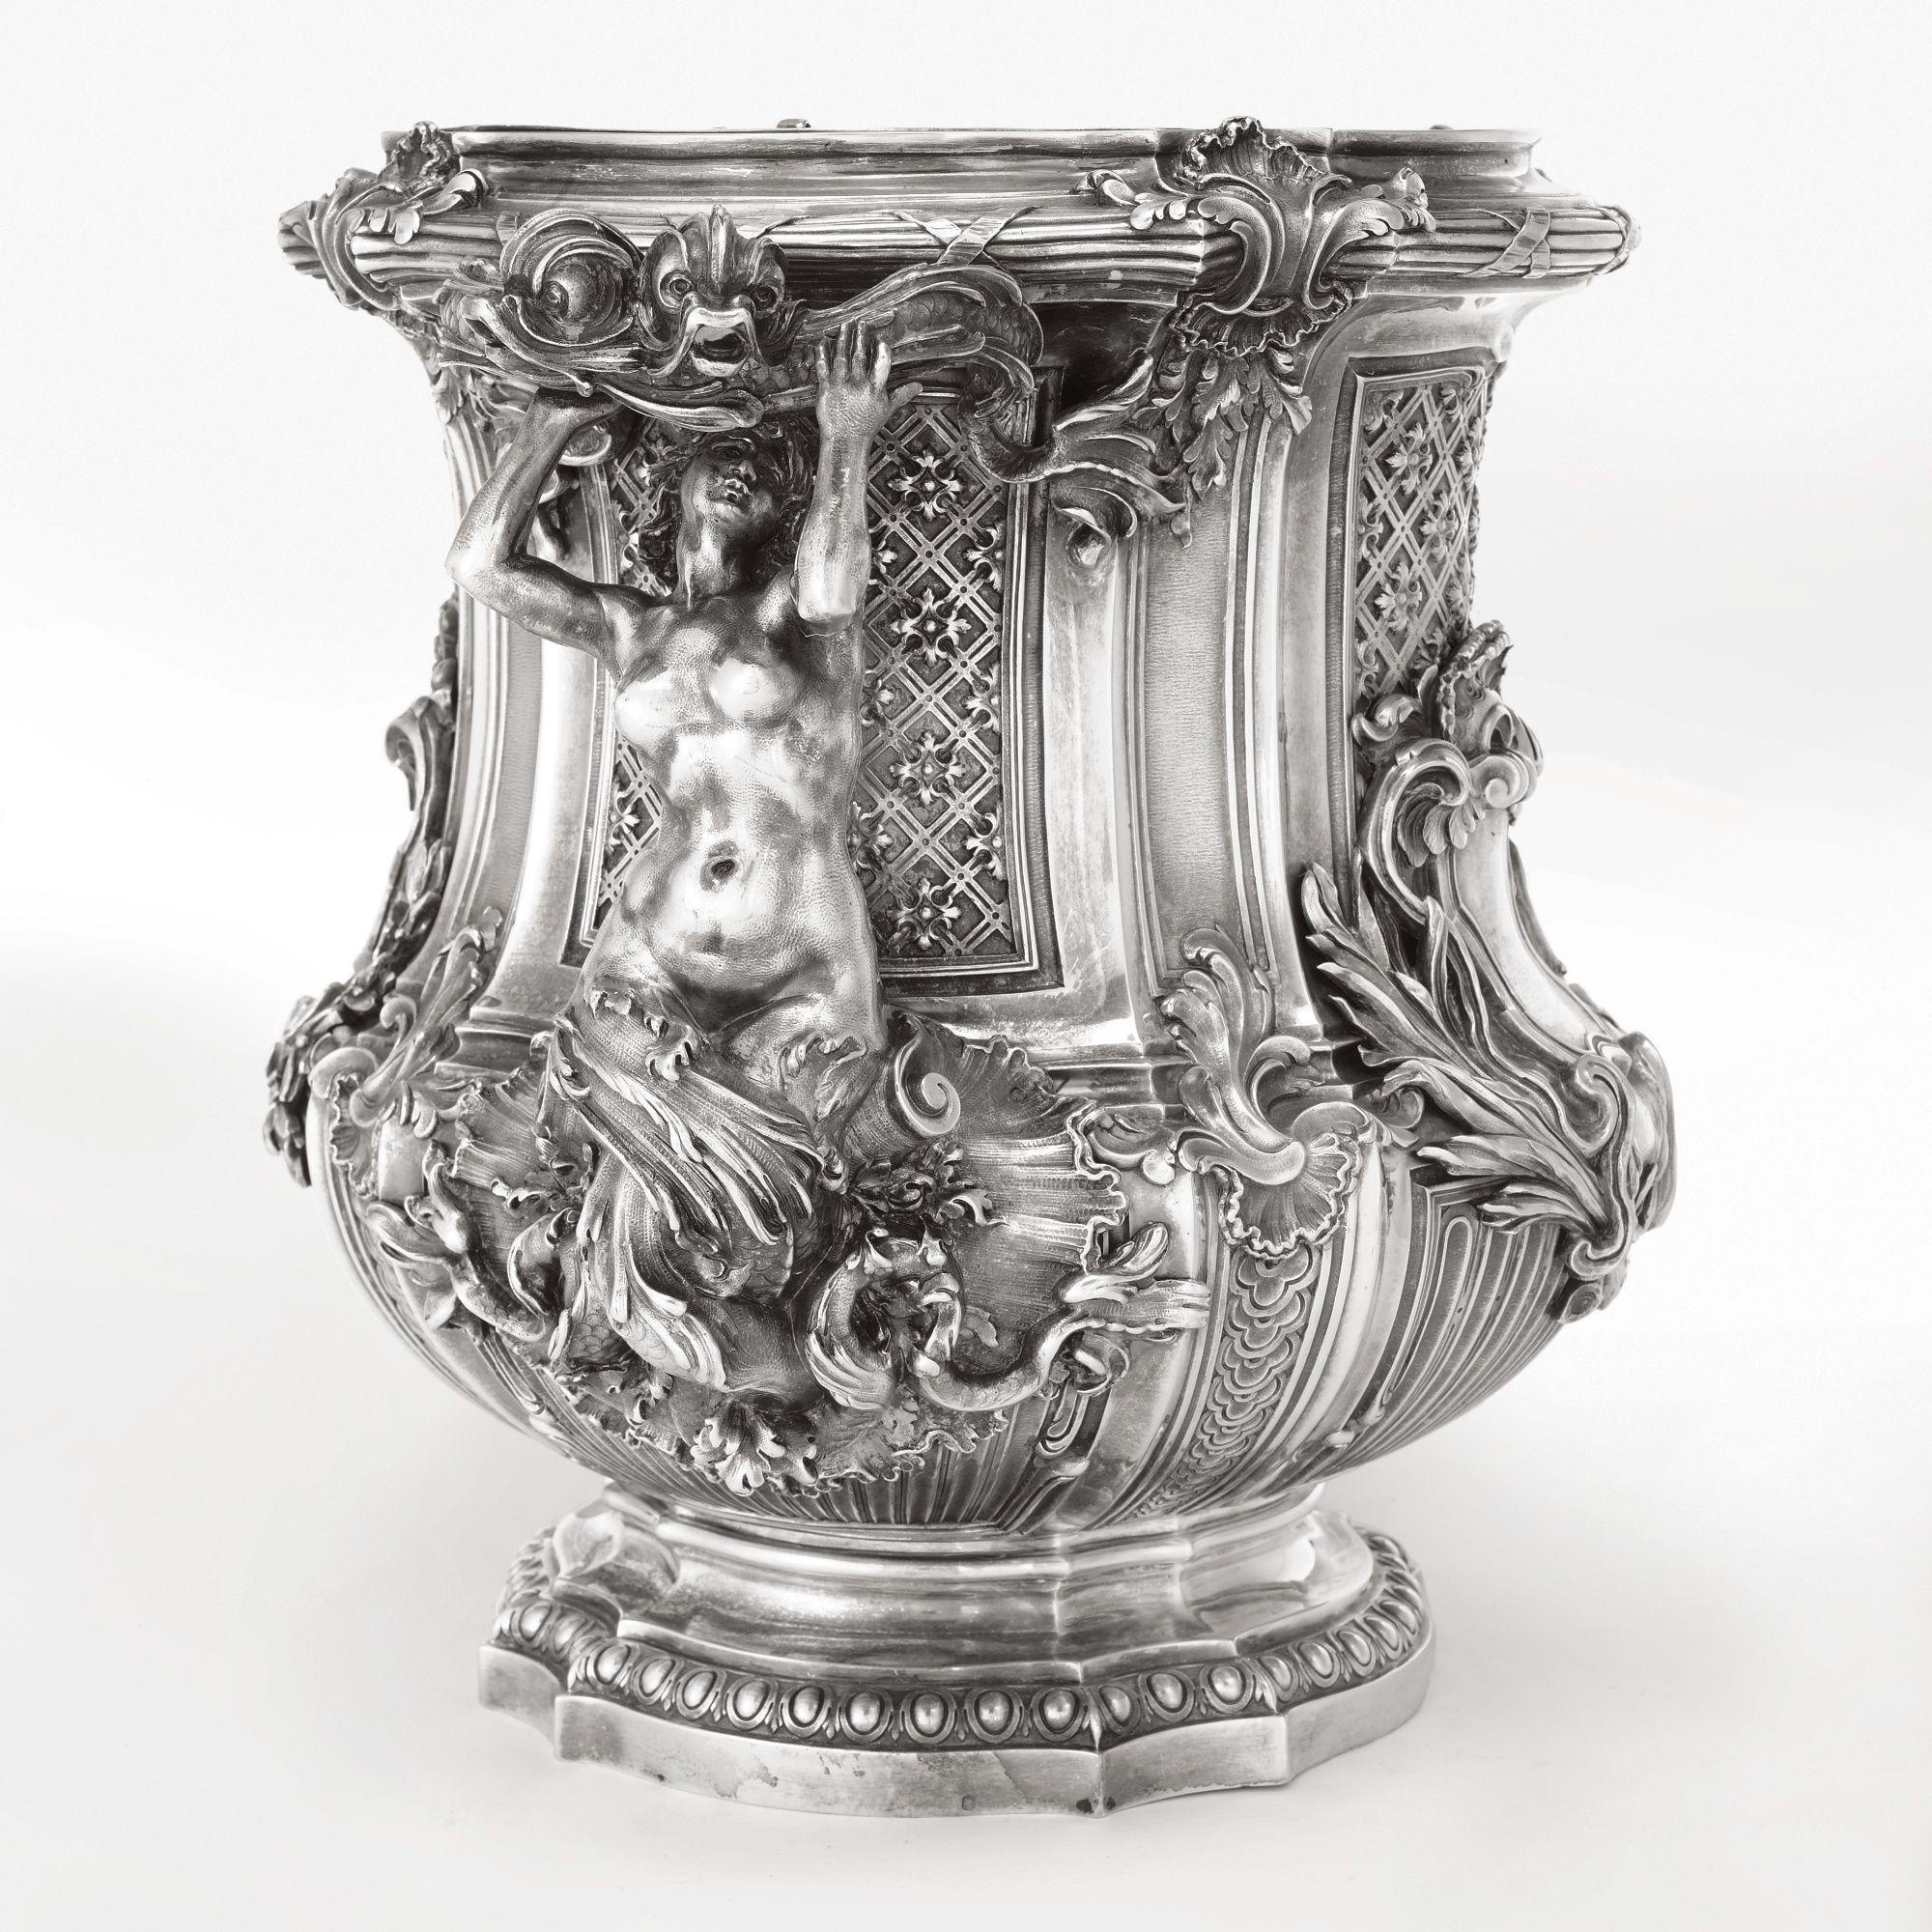 silver bowl vase of silver sothebys n08743lot5yj79en silver centerpiece pinterest regarding silver sothebys n08743lot5yj79en